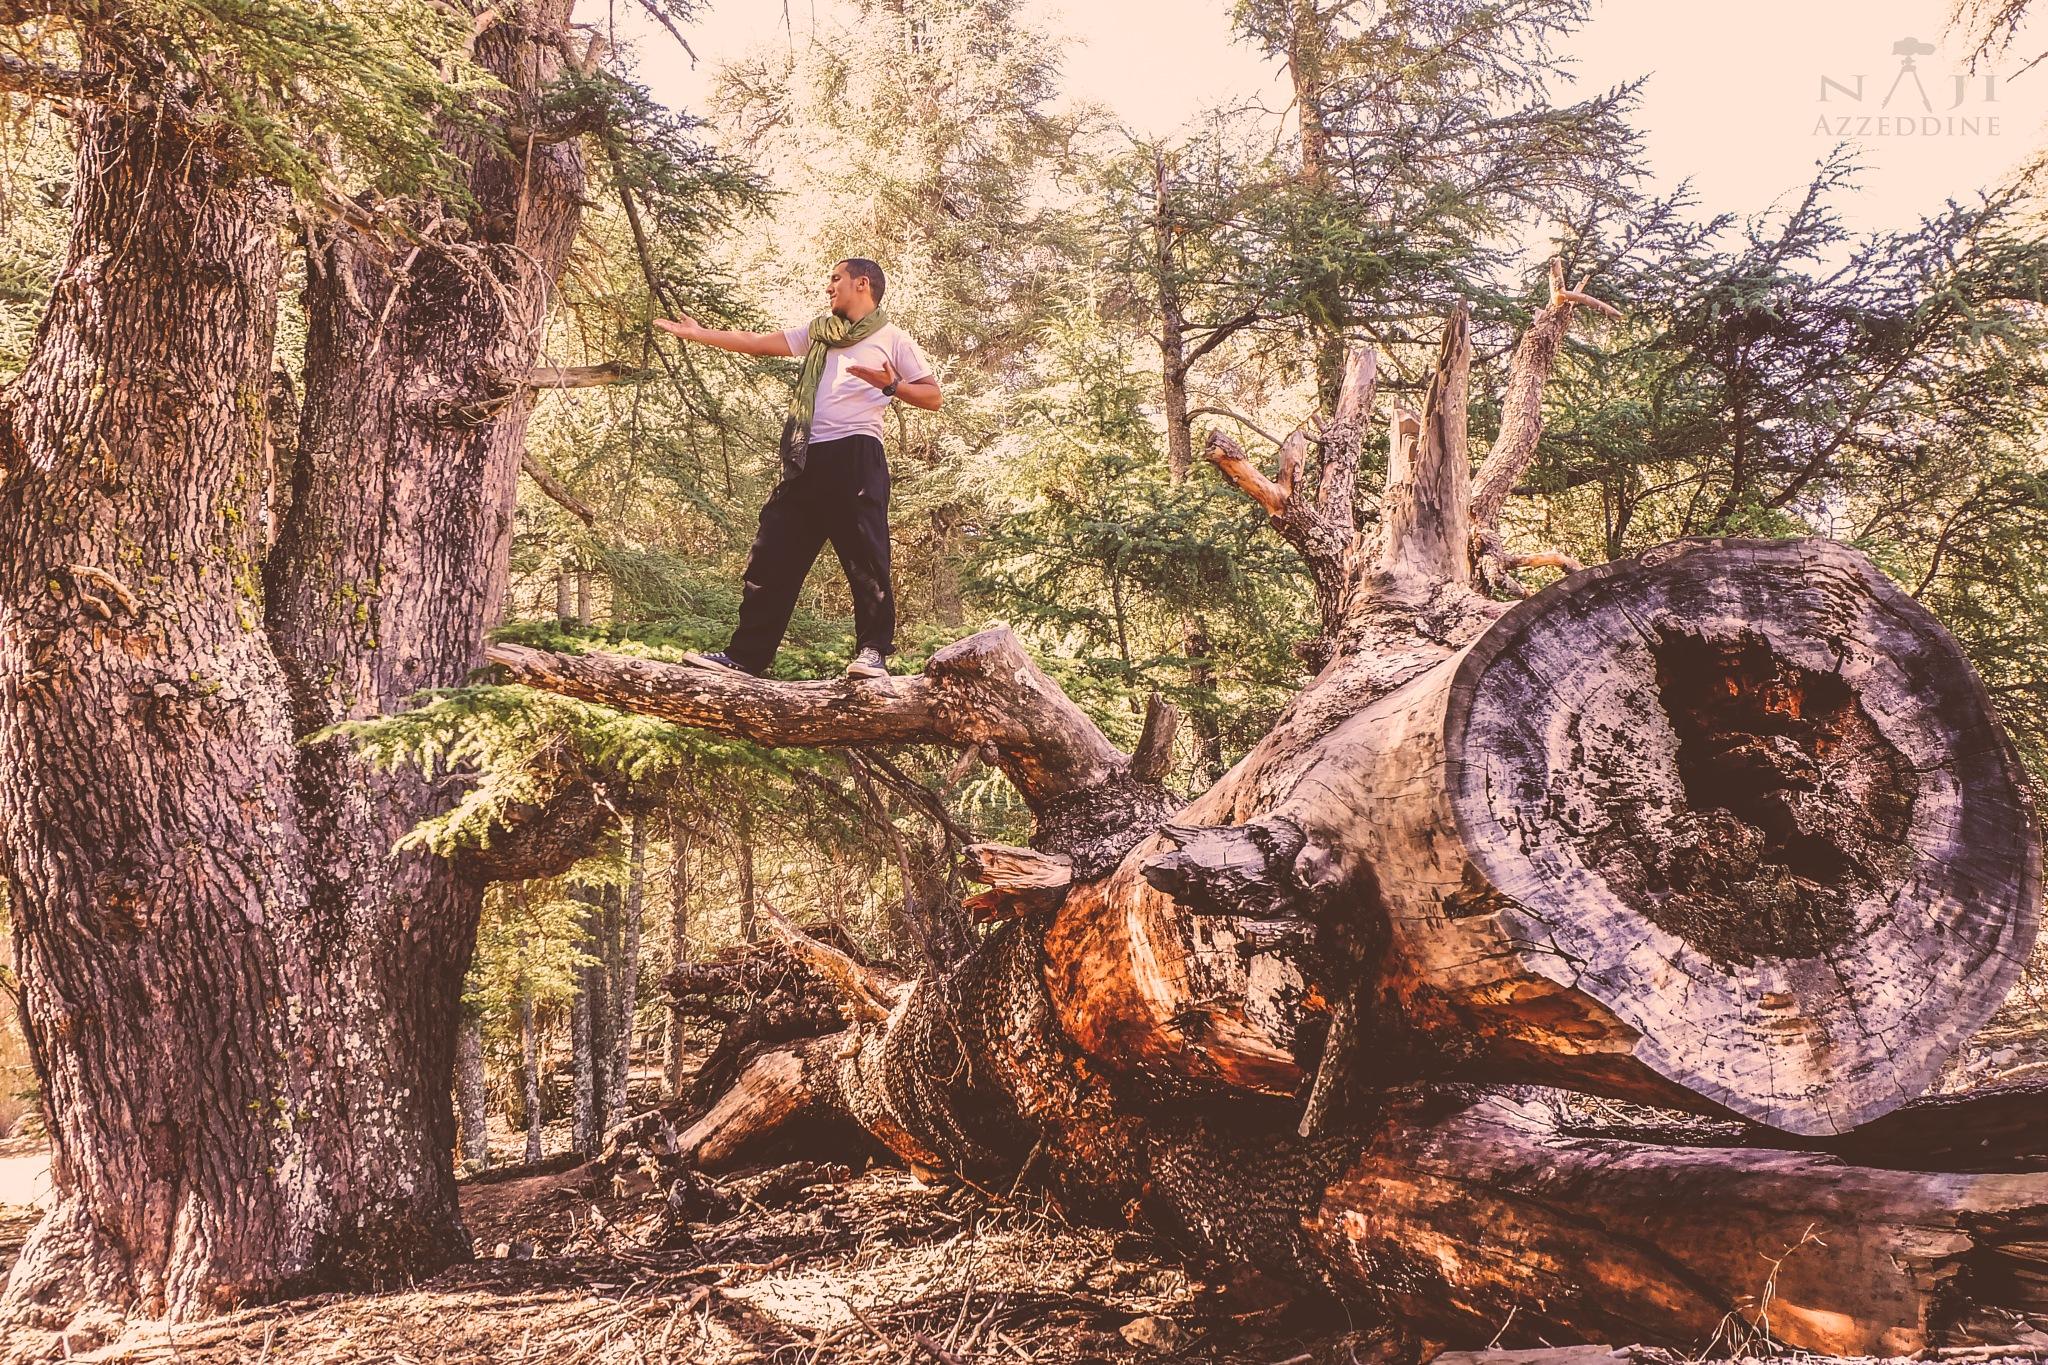 In the forest by Azzeddine Naji